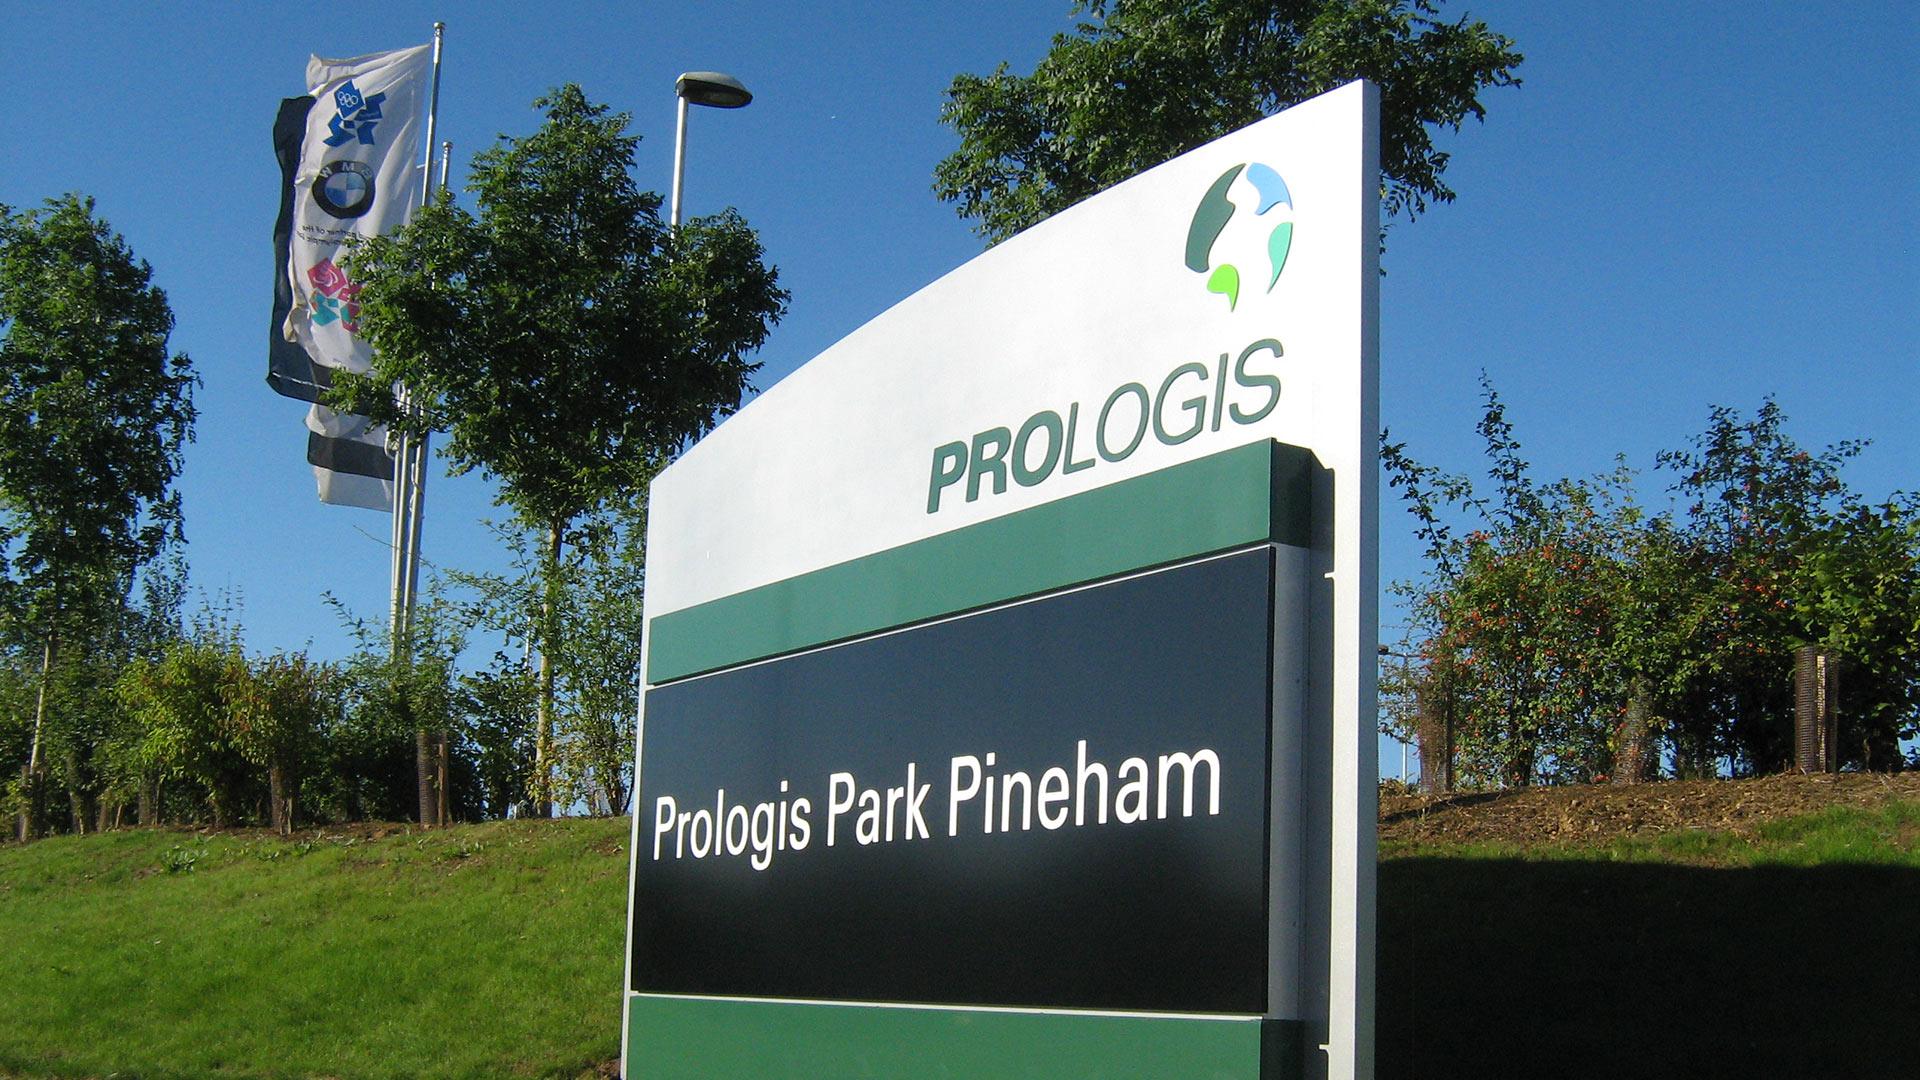 Prologis-0